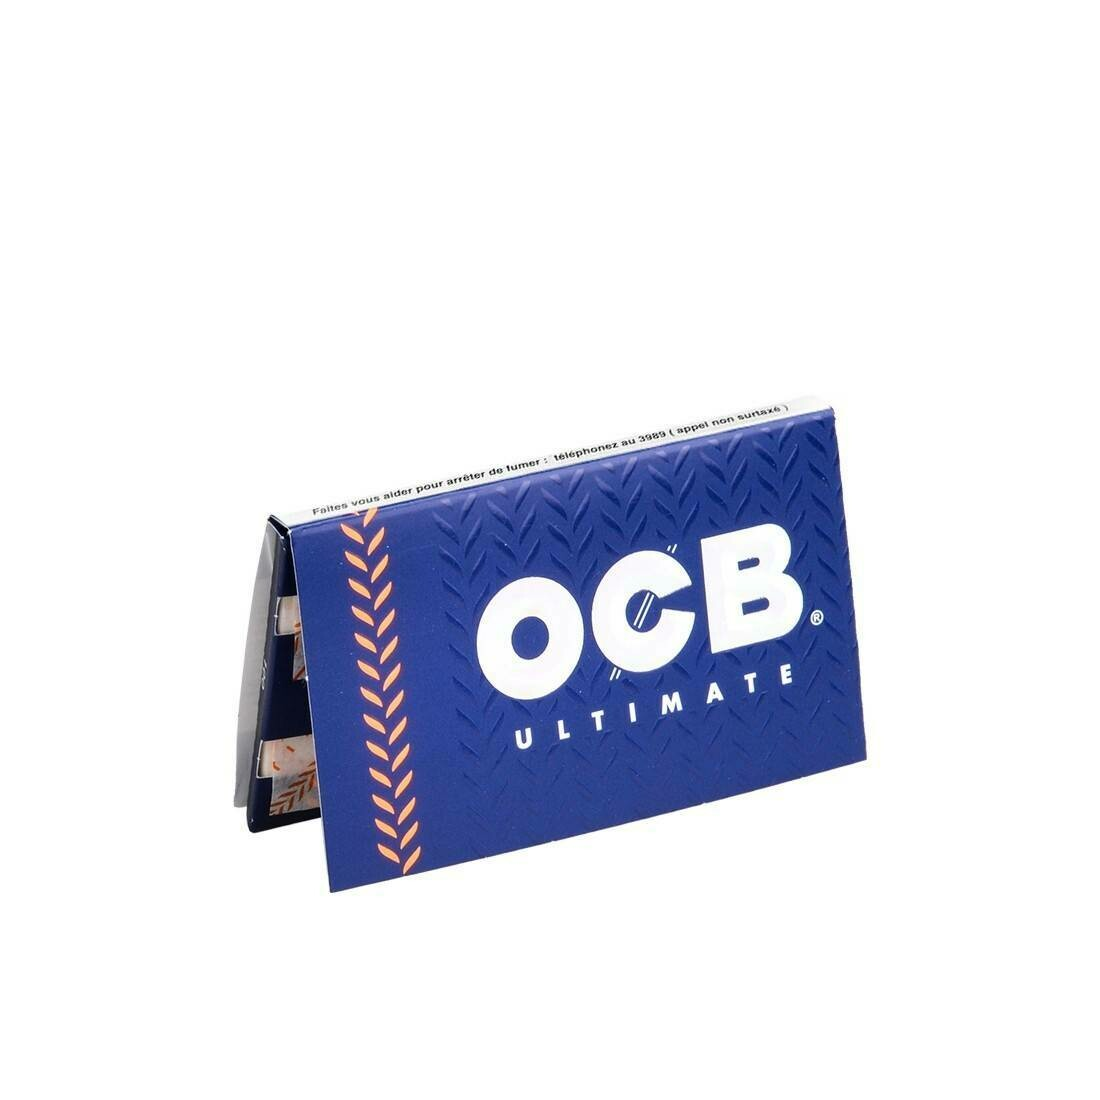 OCB - Double ultimate slim